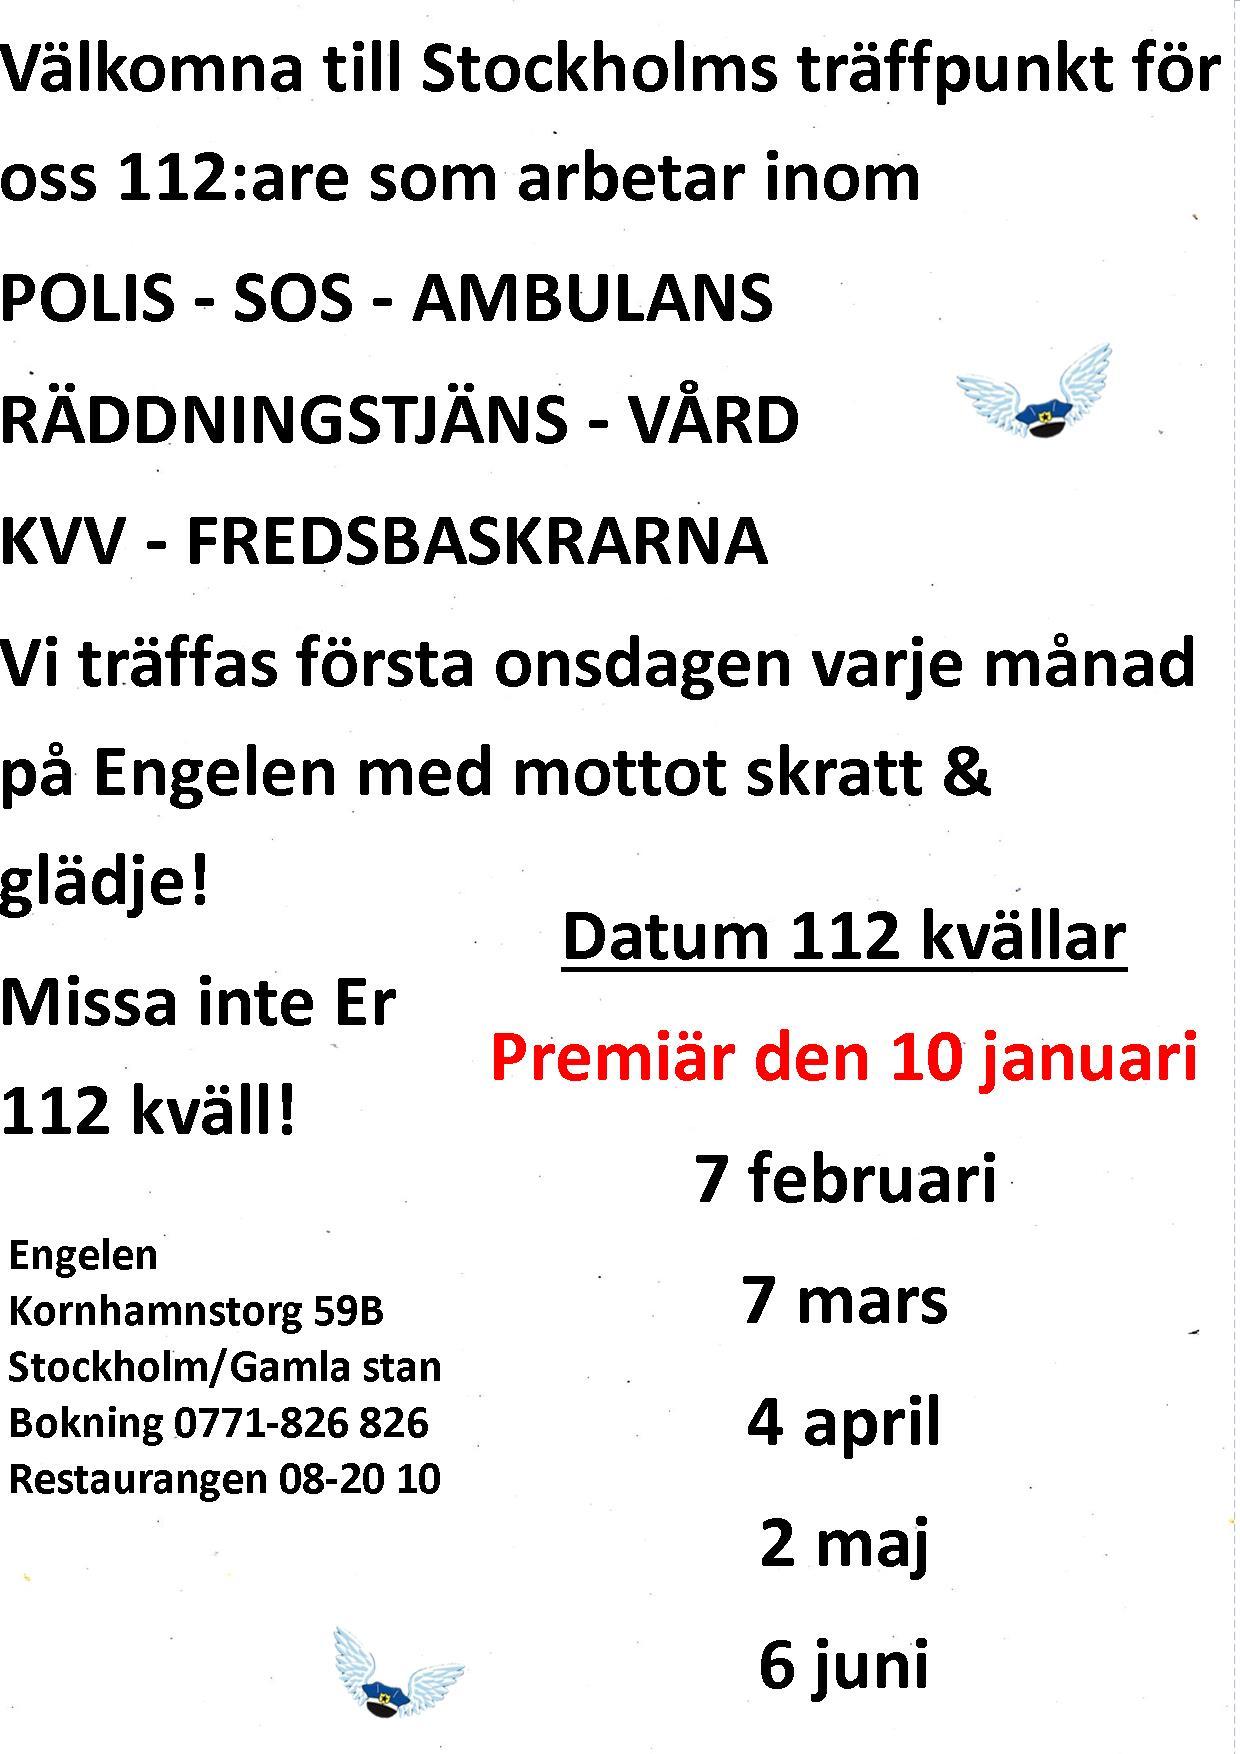 Stockholm Englaklubbens text hemsida